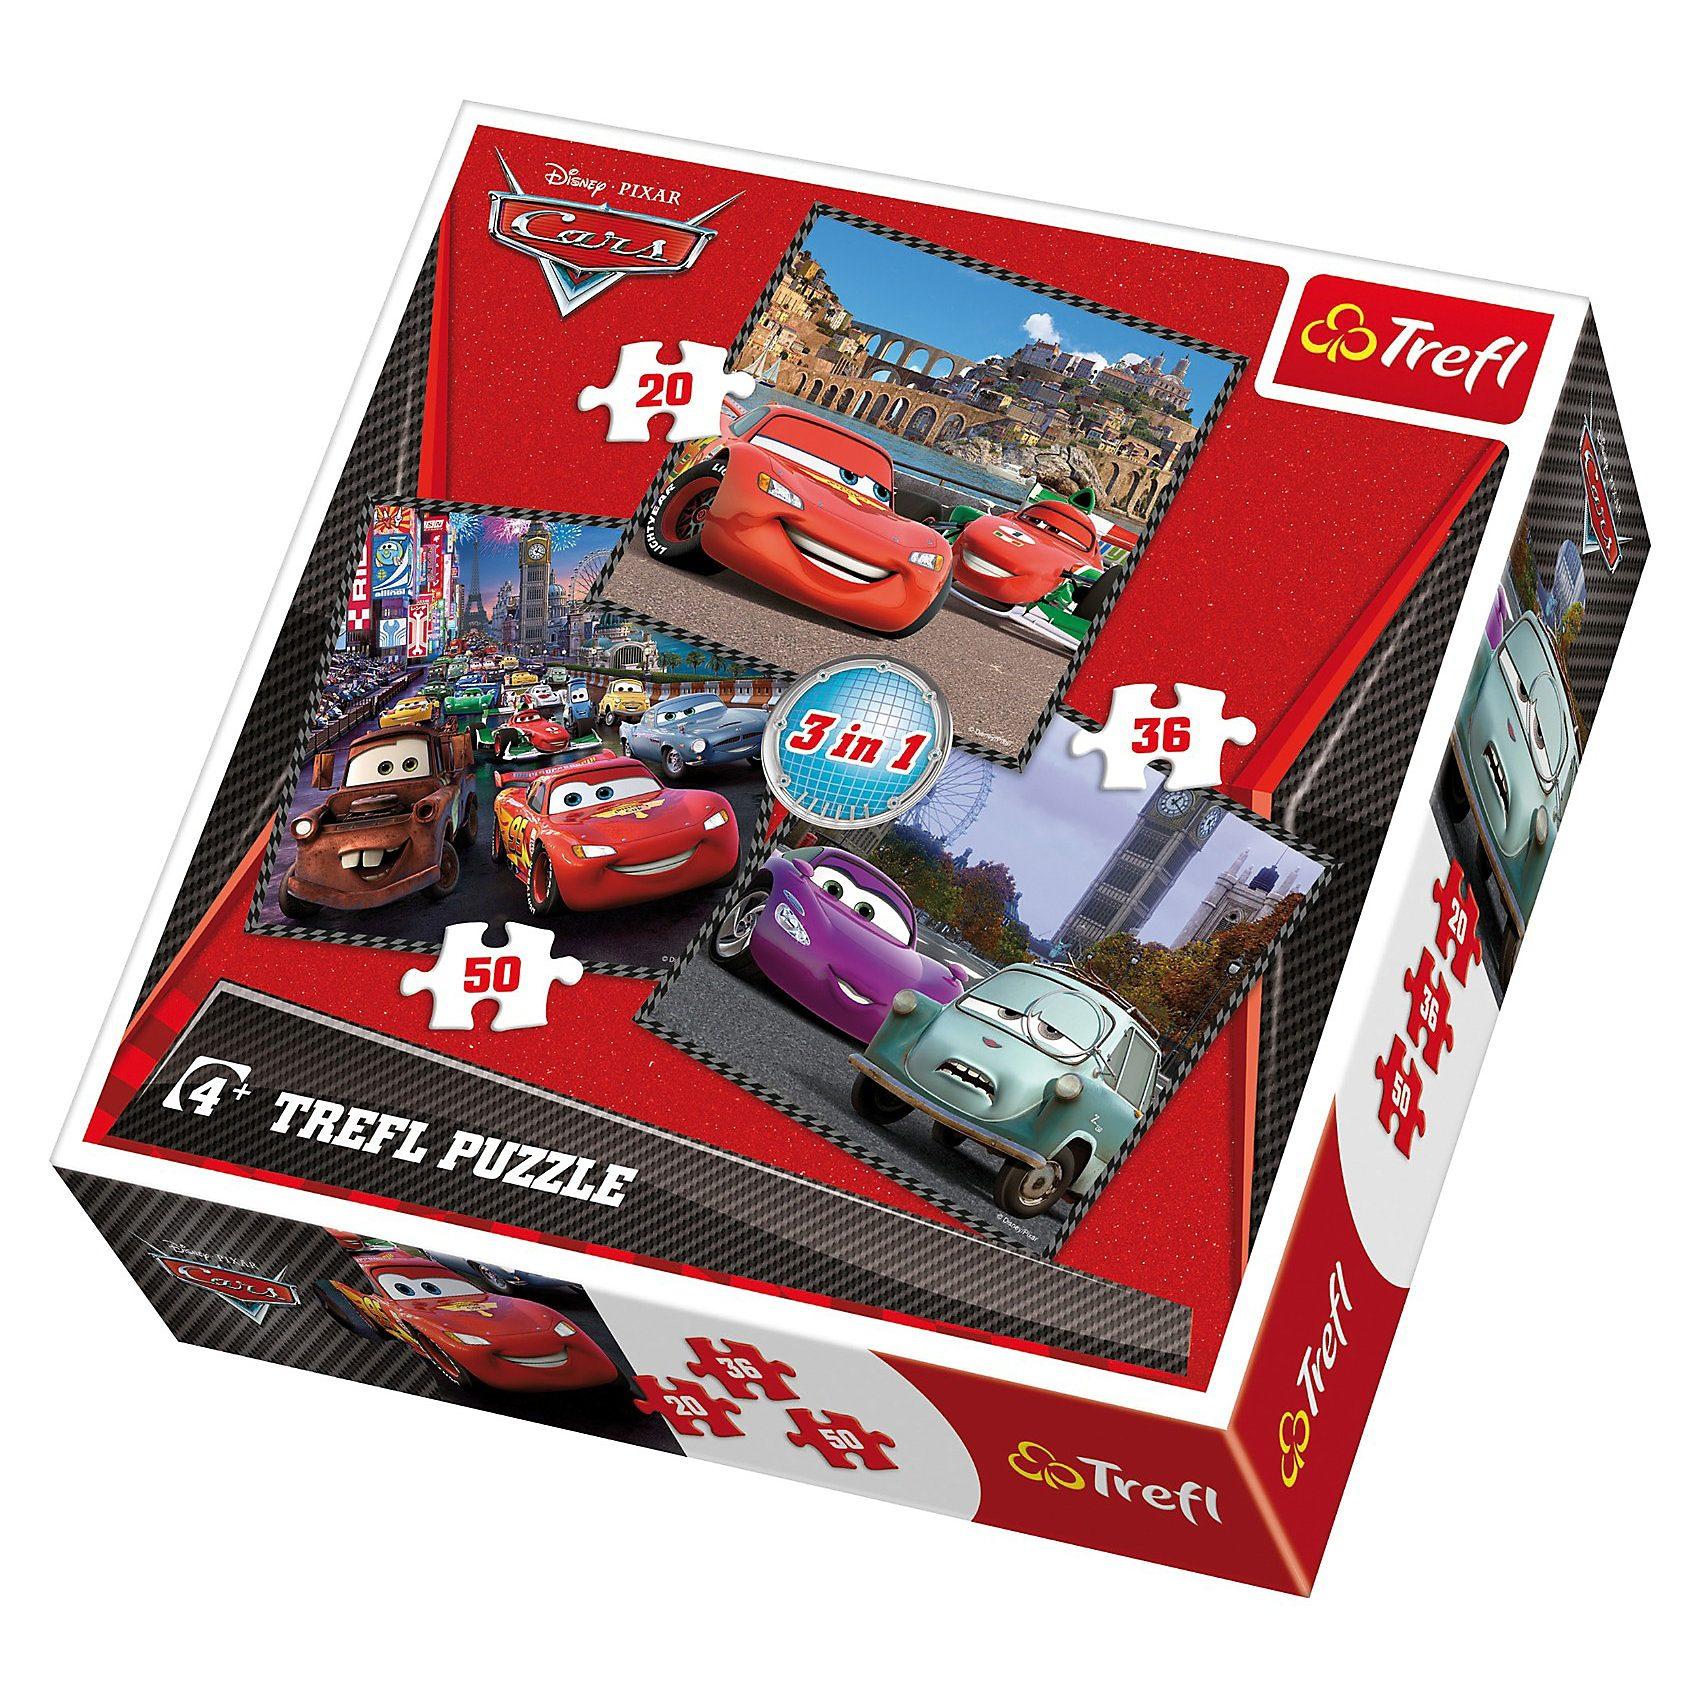 Trefl Puzzle-Set 3in1 - 20/36/50 Teile - Cars